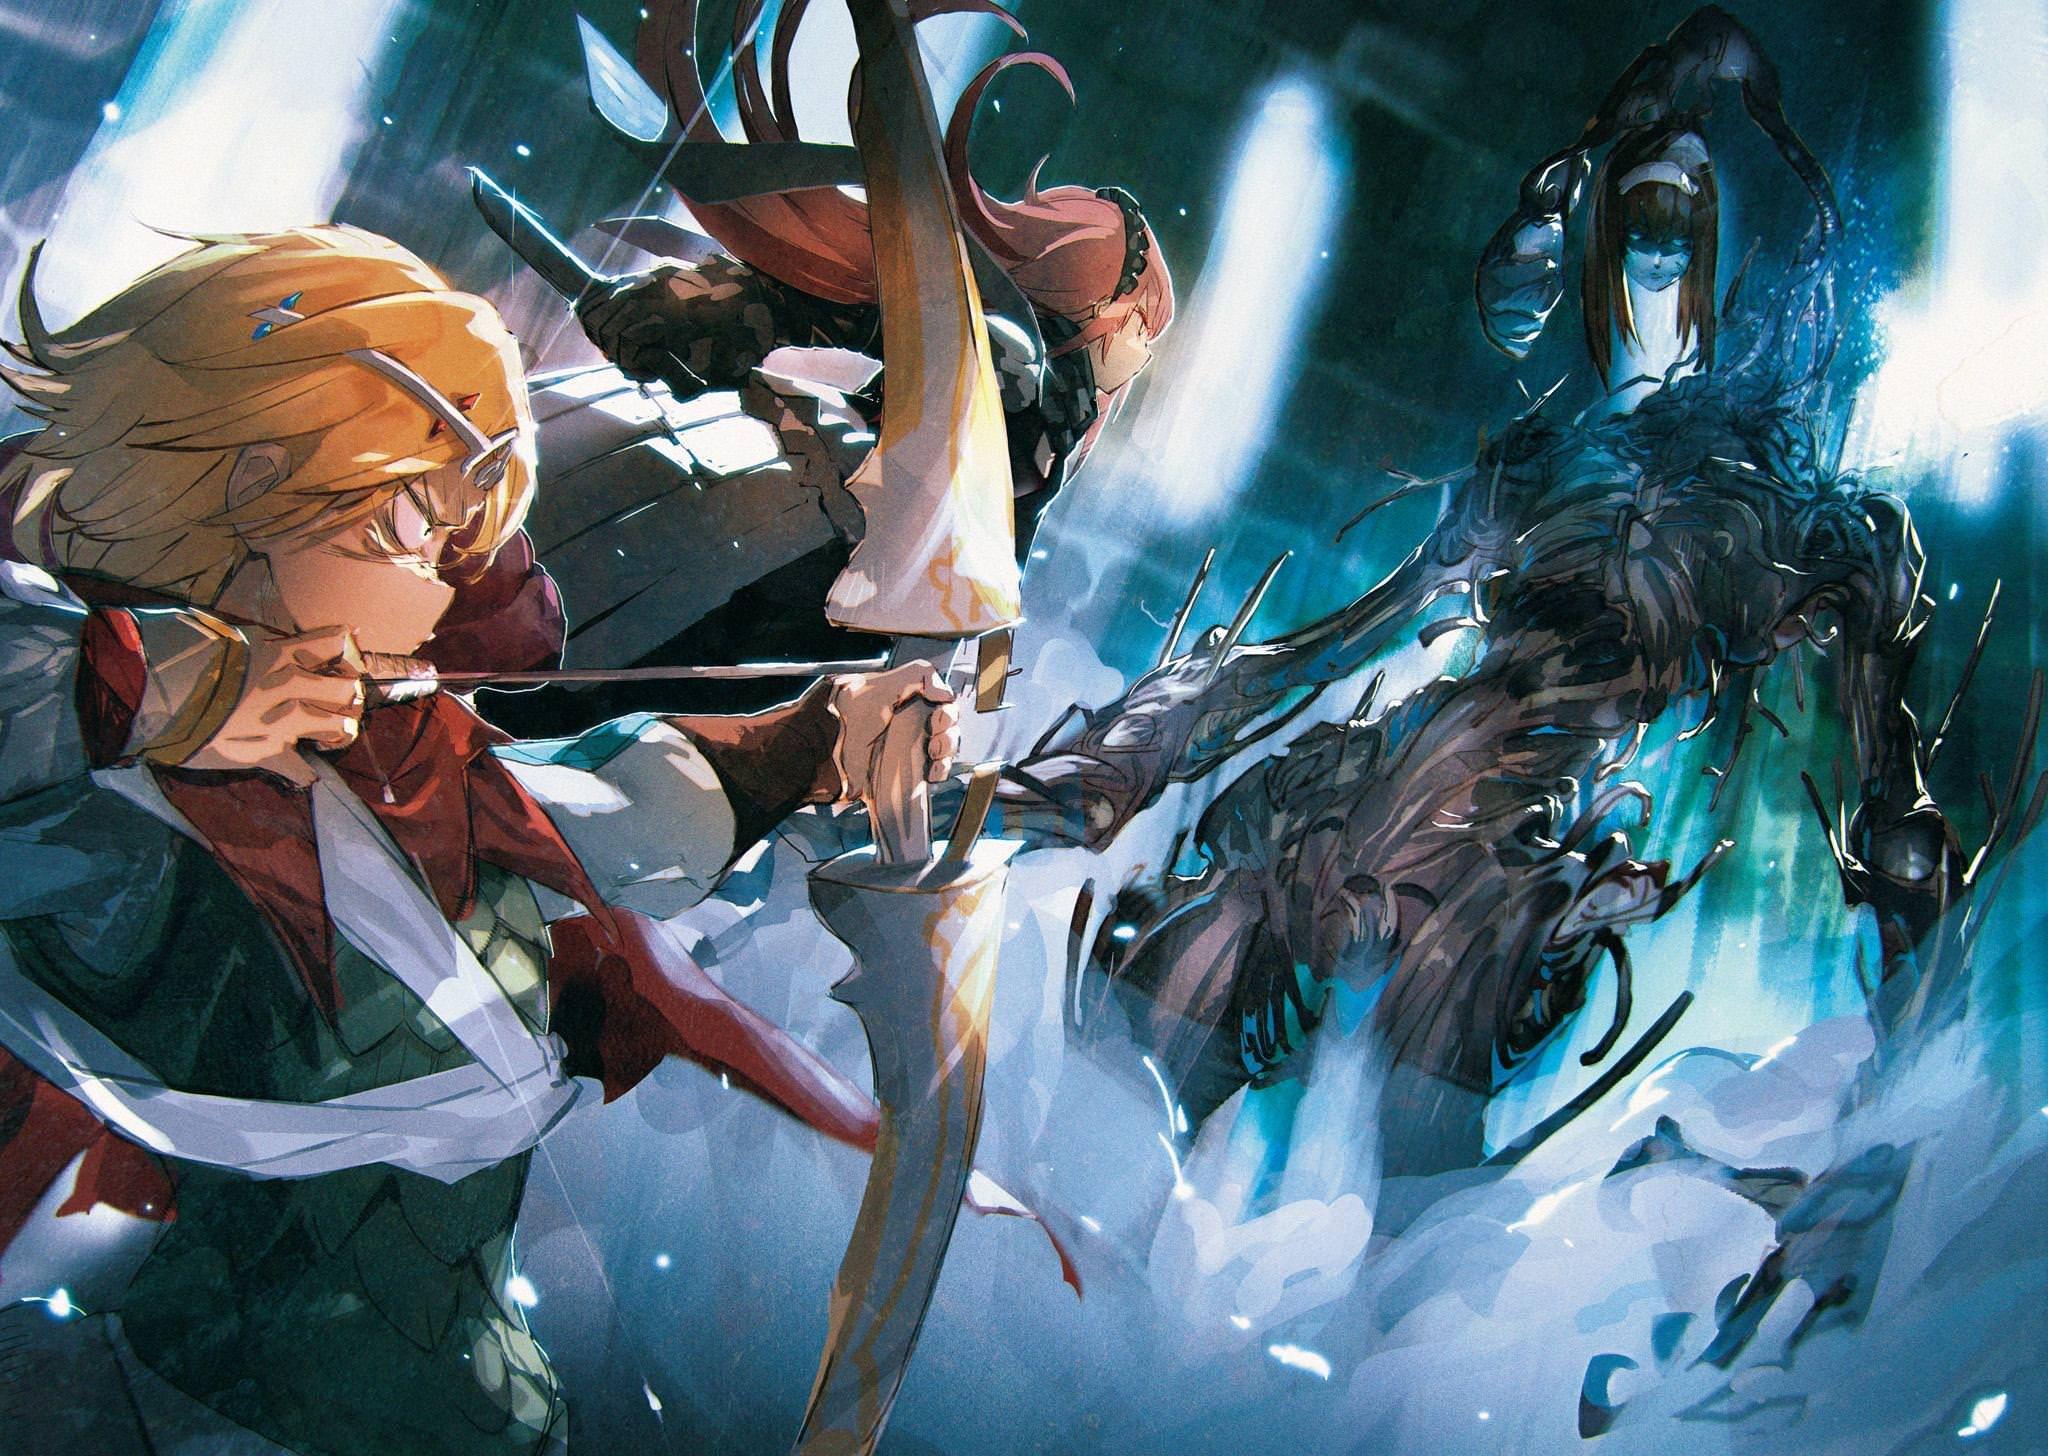 Mobile and Desktop Wallpaper HD in 2020 Anime, Anime